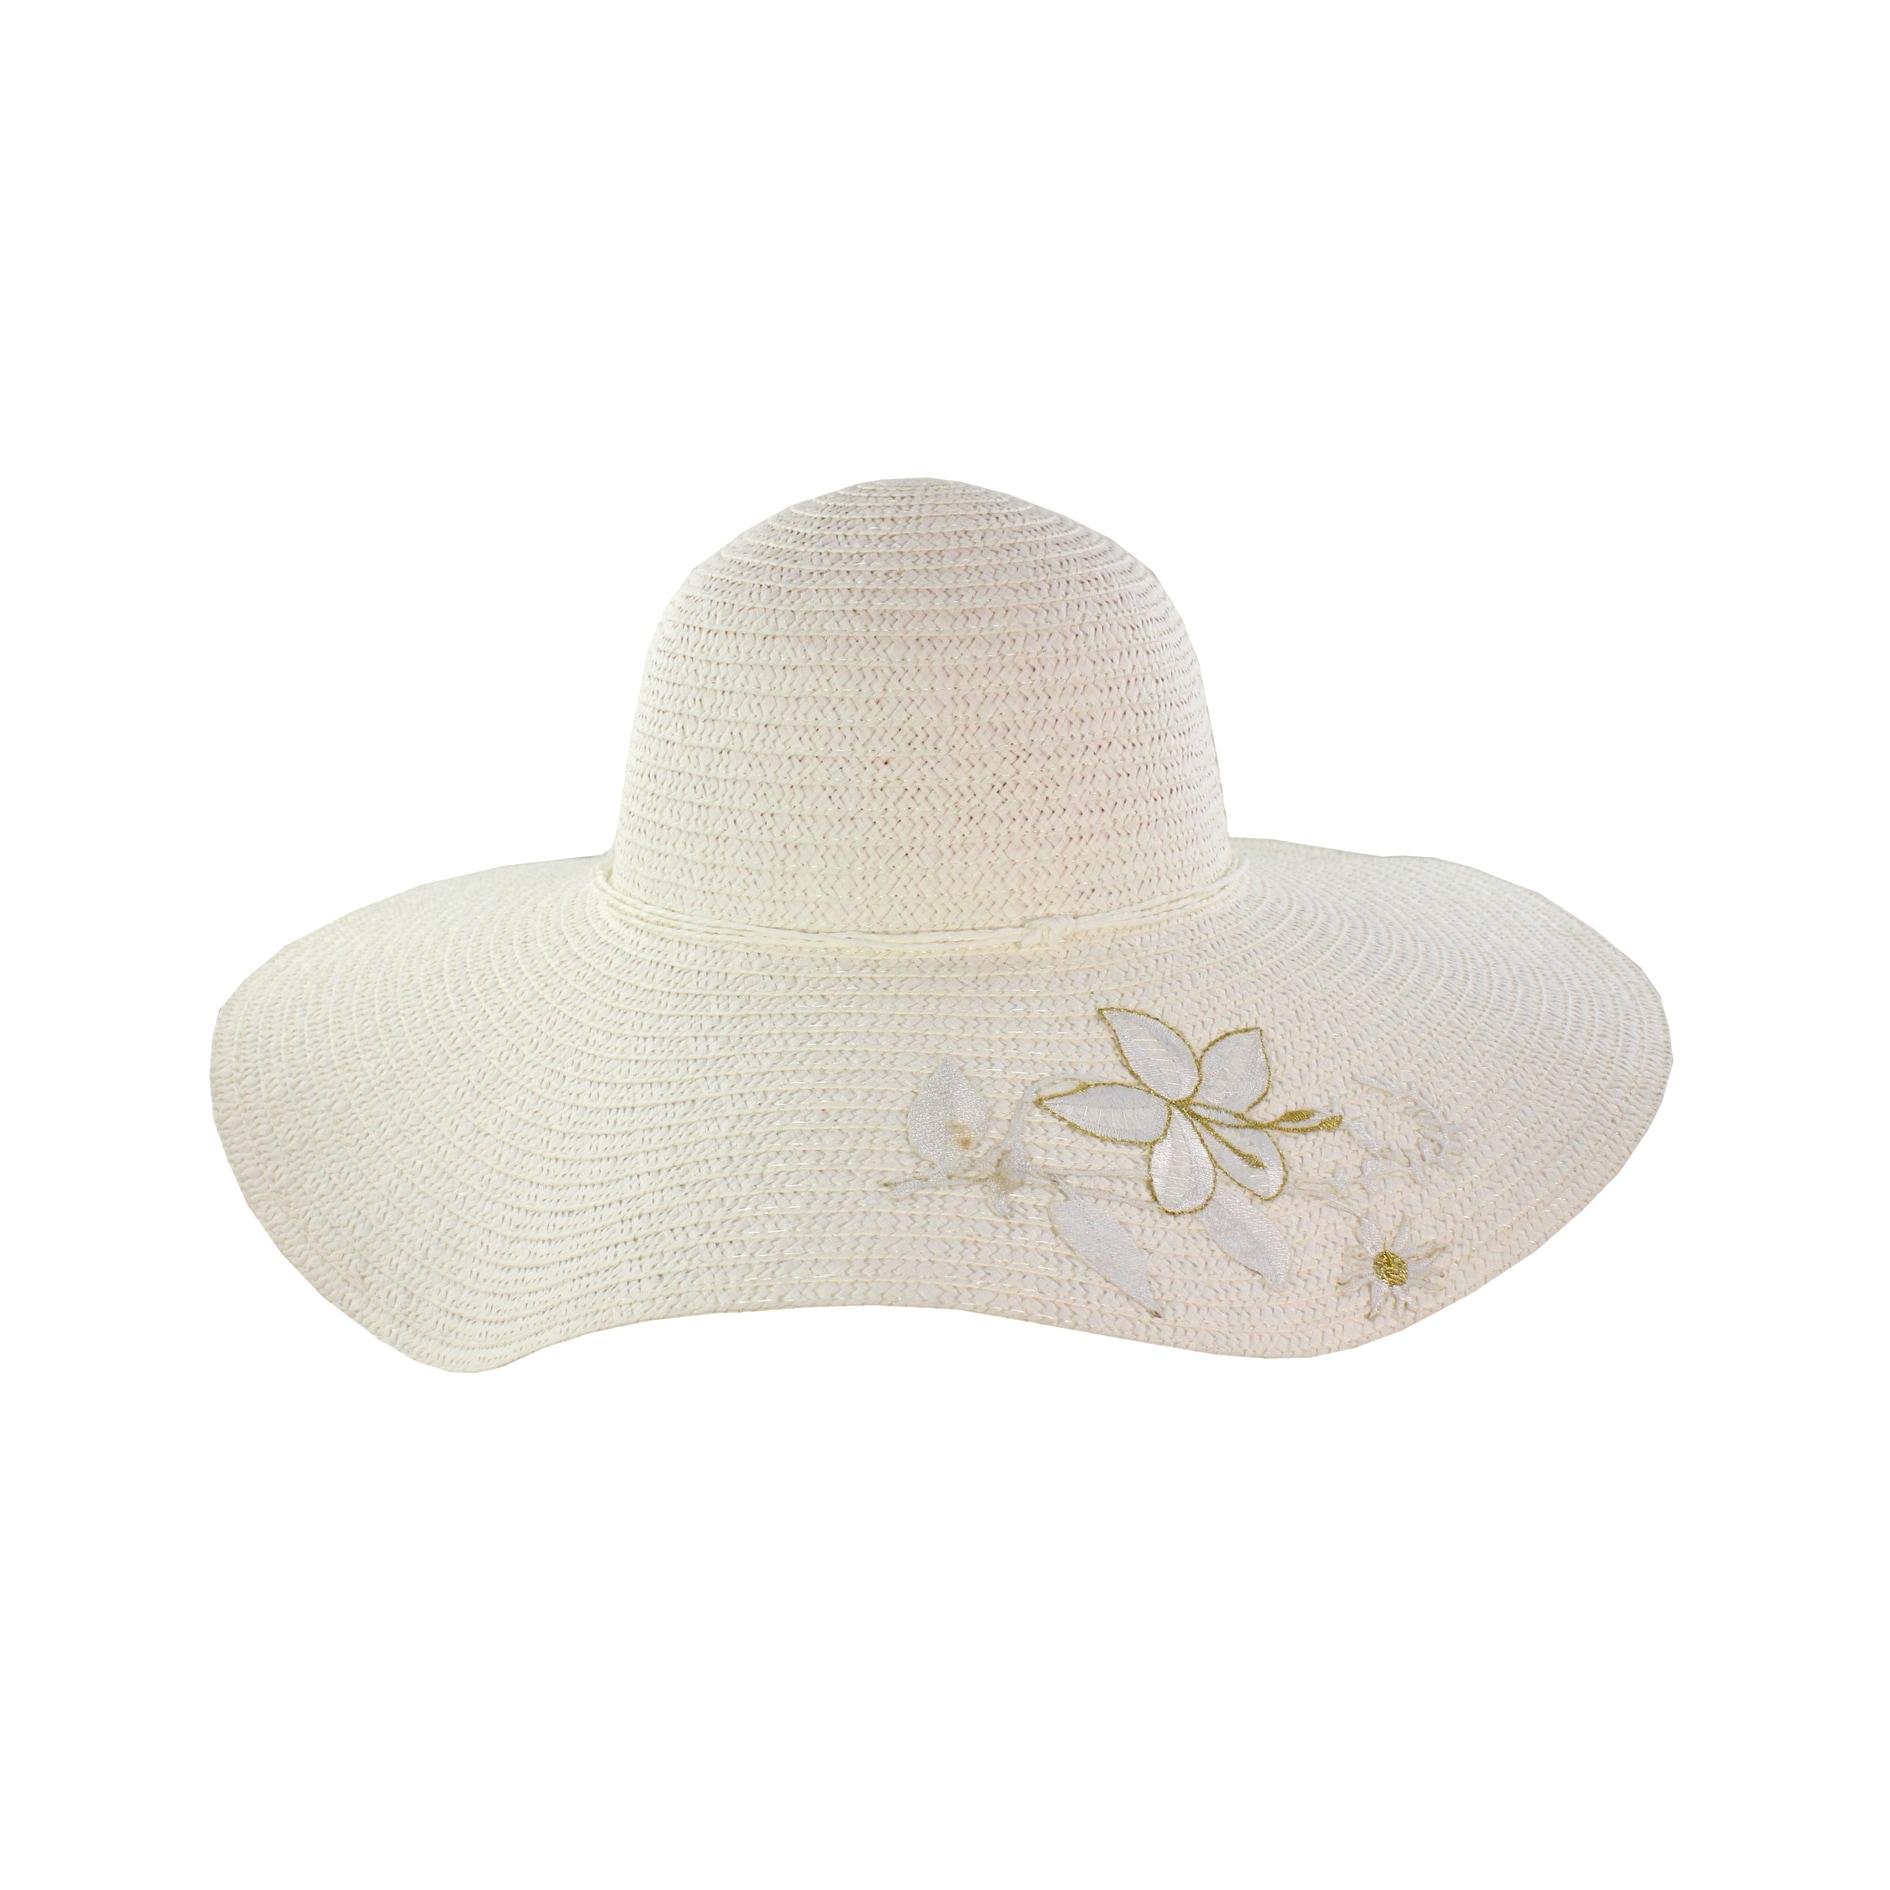 5a725e0b467 Faddism Womens White Flower Straw Sun Hat (StrawOne size fits most ...